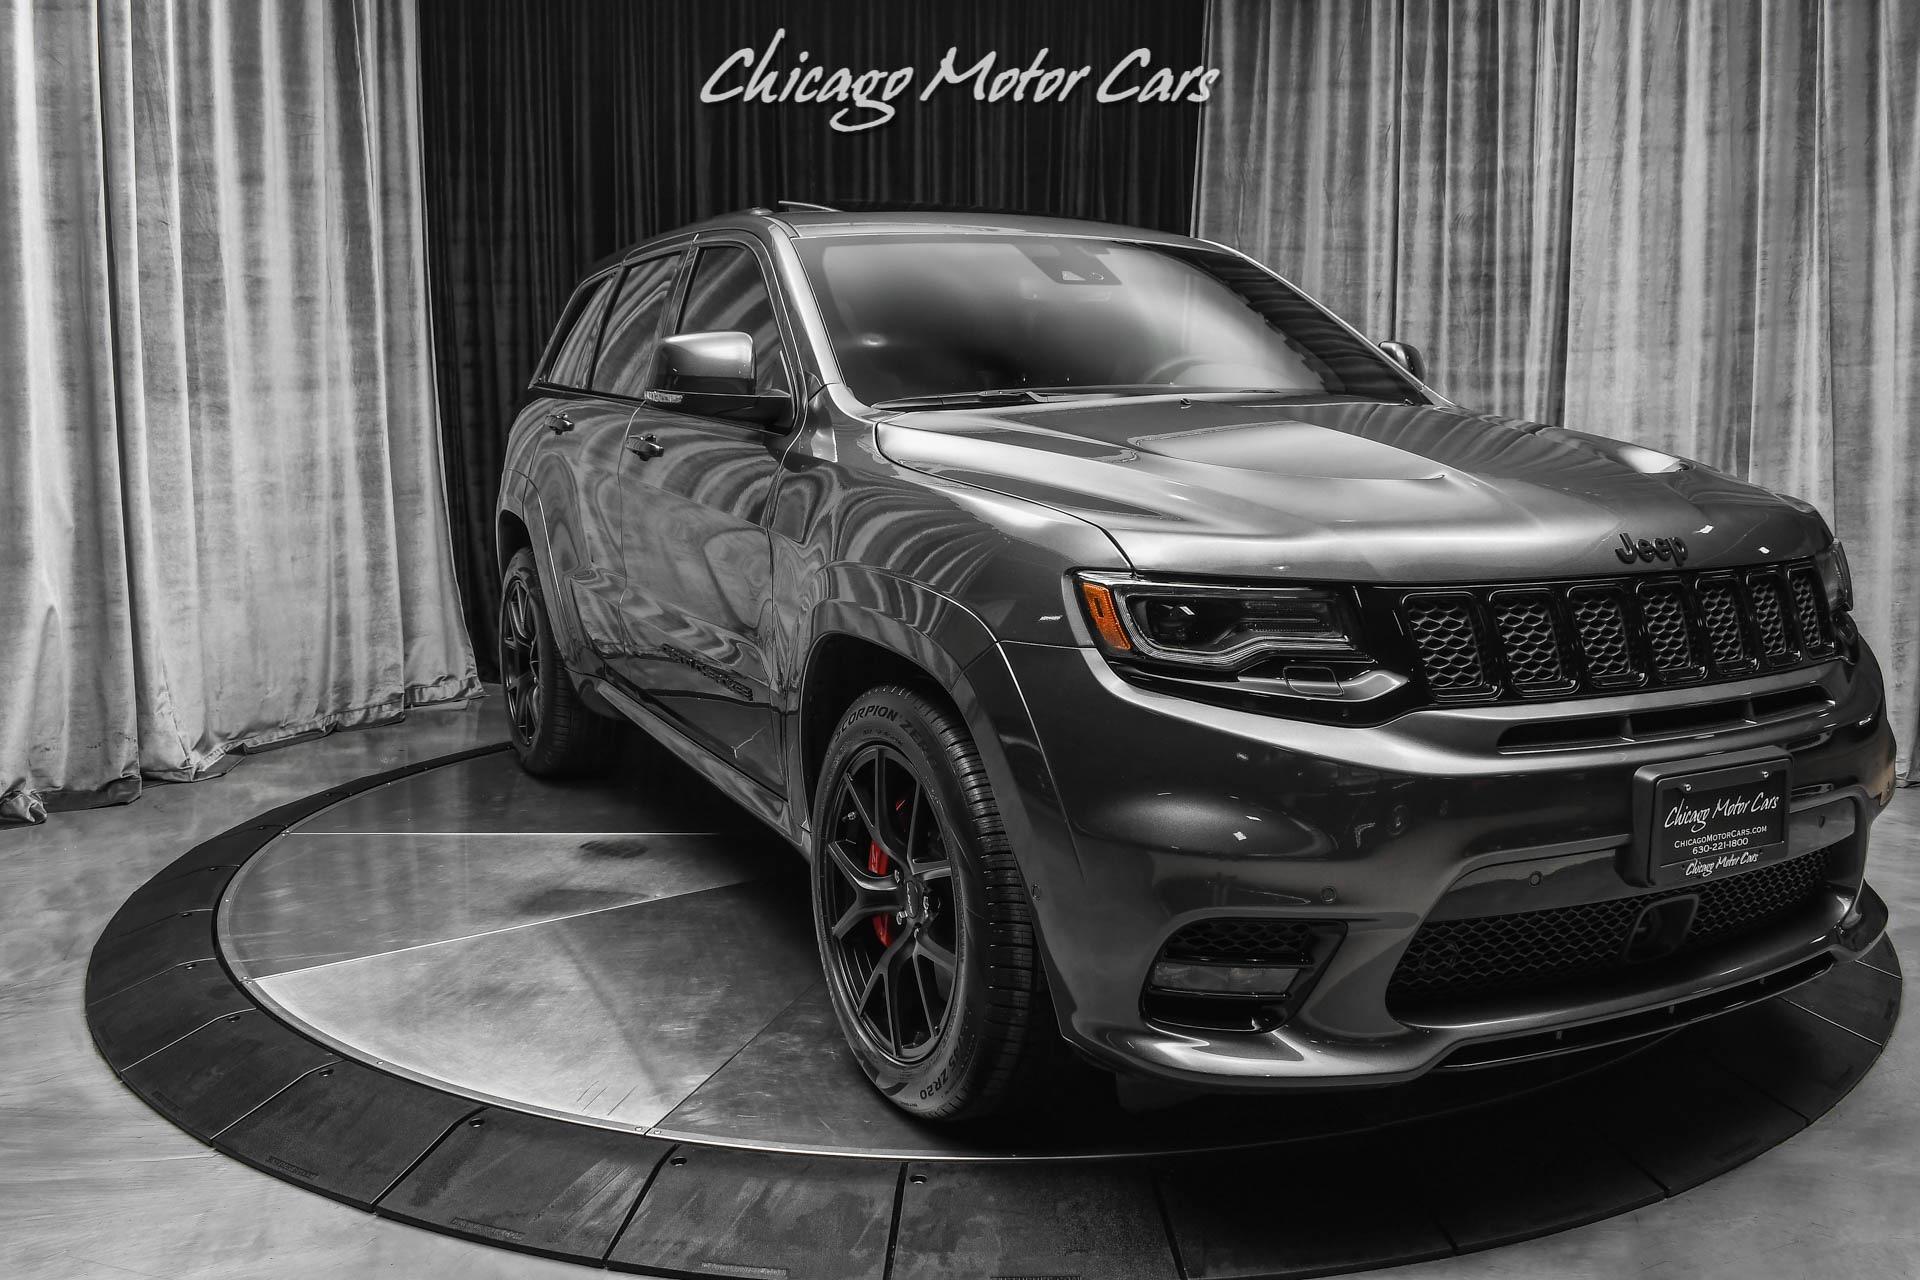 Used-2021-Jeep-Grand-Cherokee-SRT-SUV-DELIVERY-MILES-SUNROOF-HIGH-PERFORMANCE-AUDIO---BRAKES